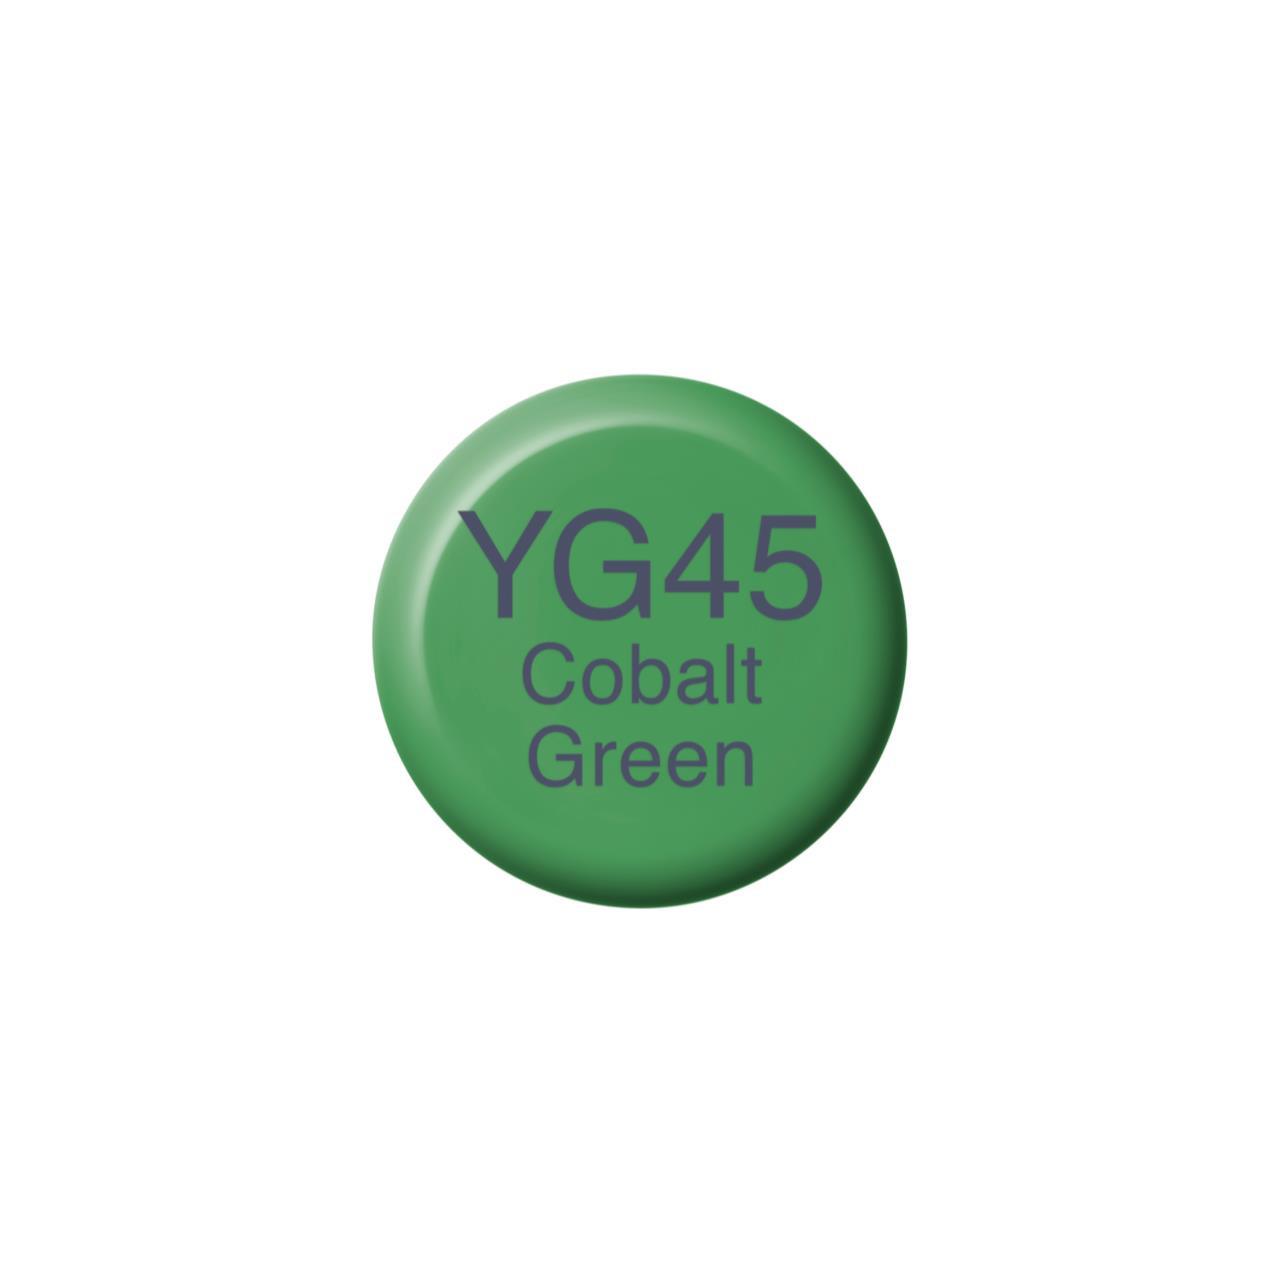 YG45 Cobalt Green, Copic Ink - 4511338058480